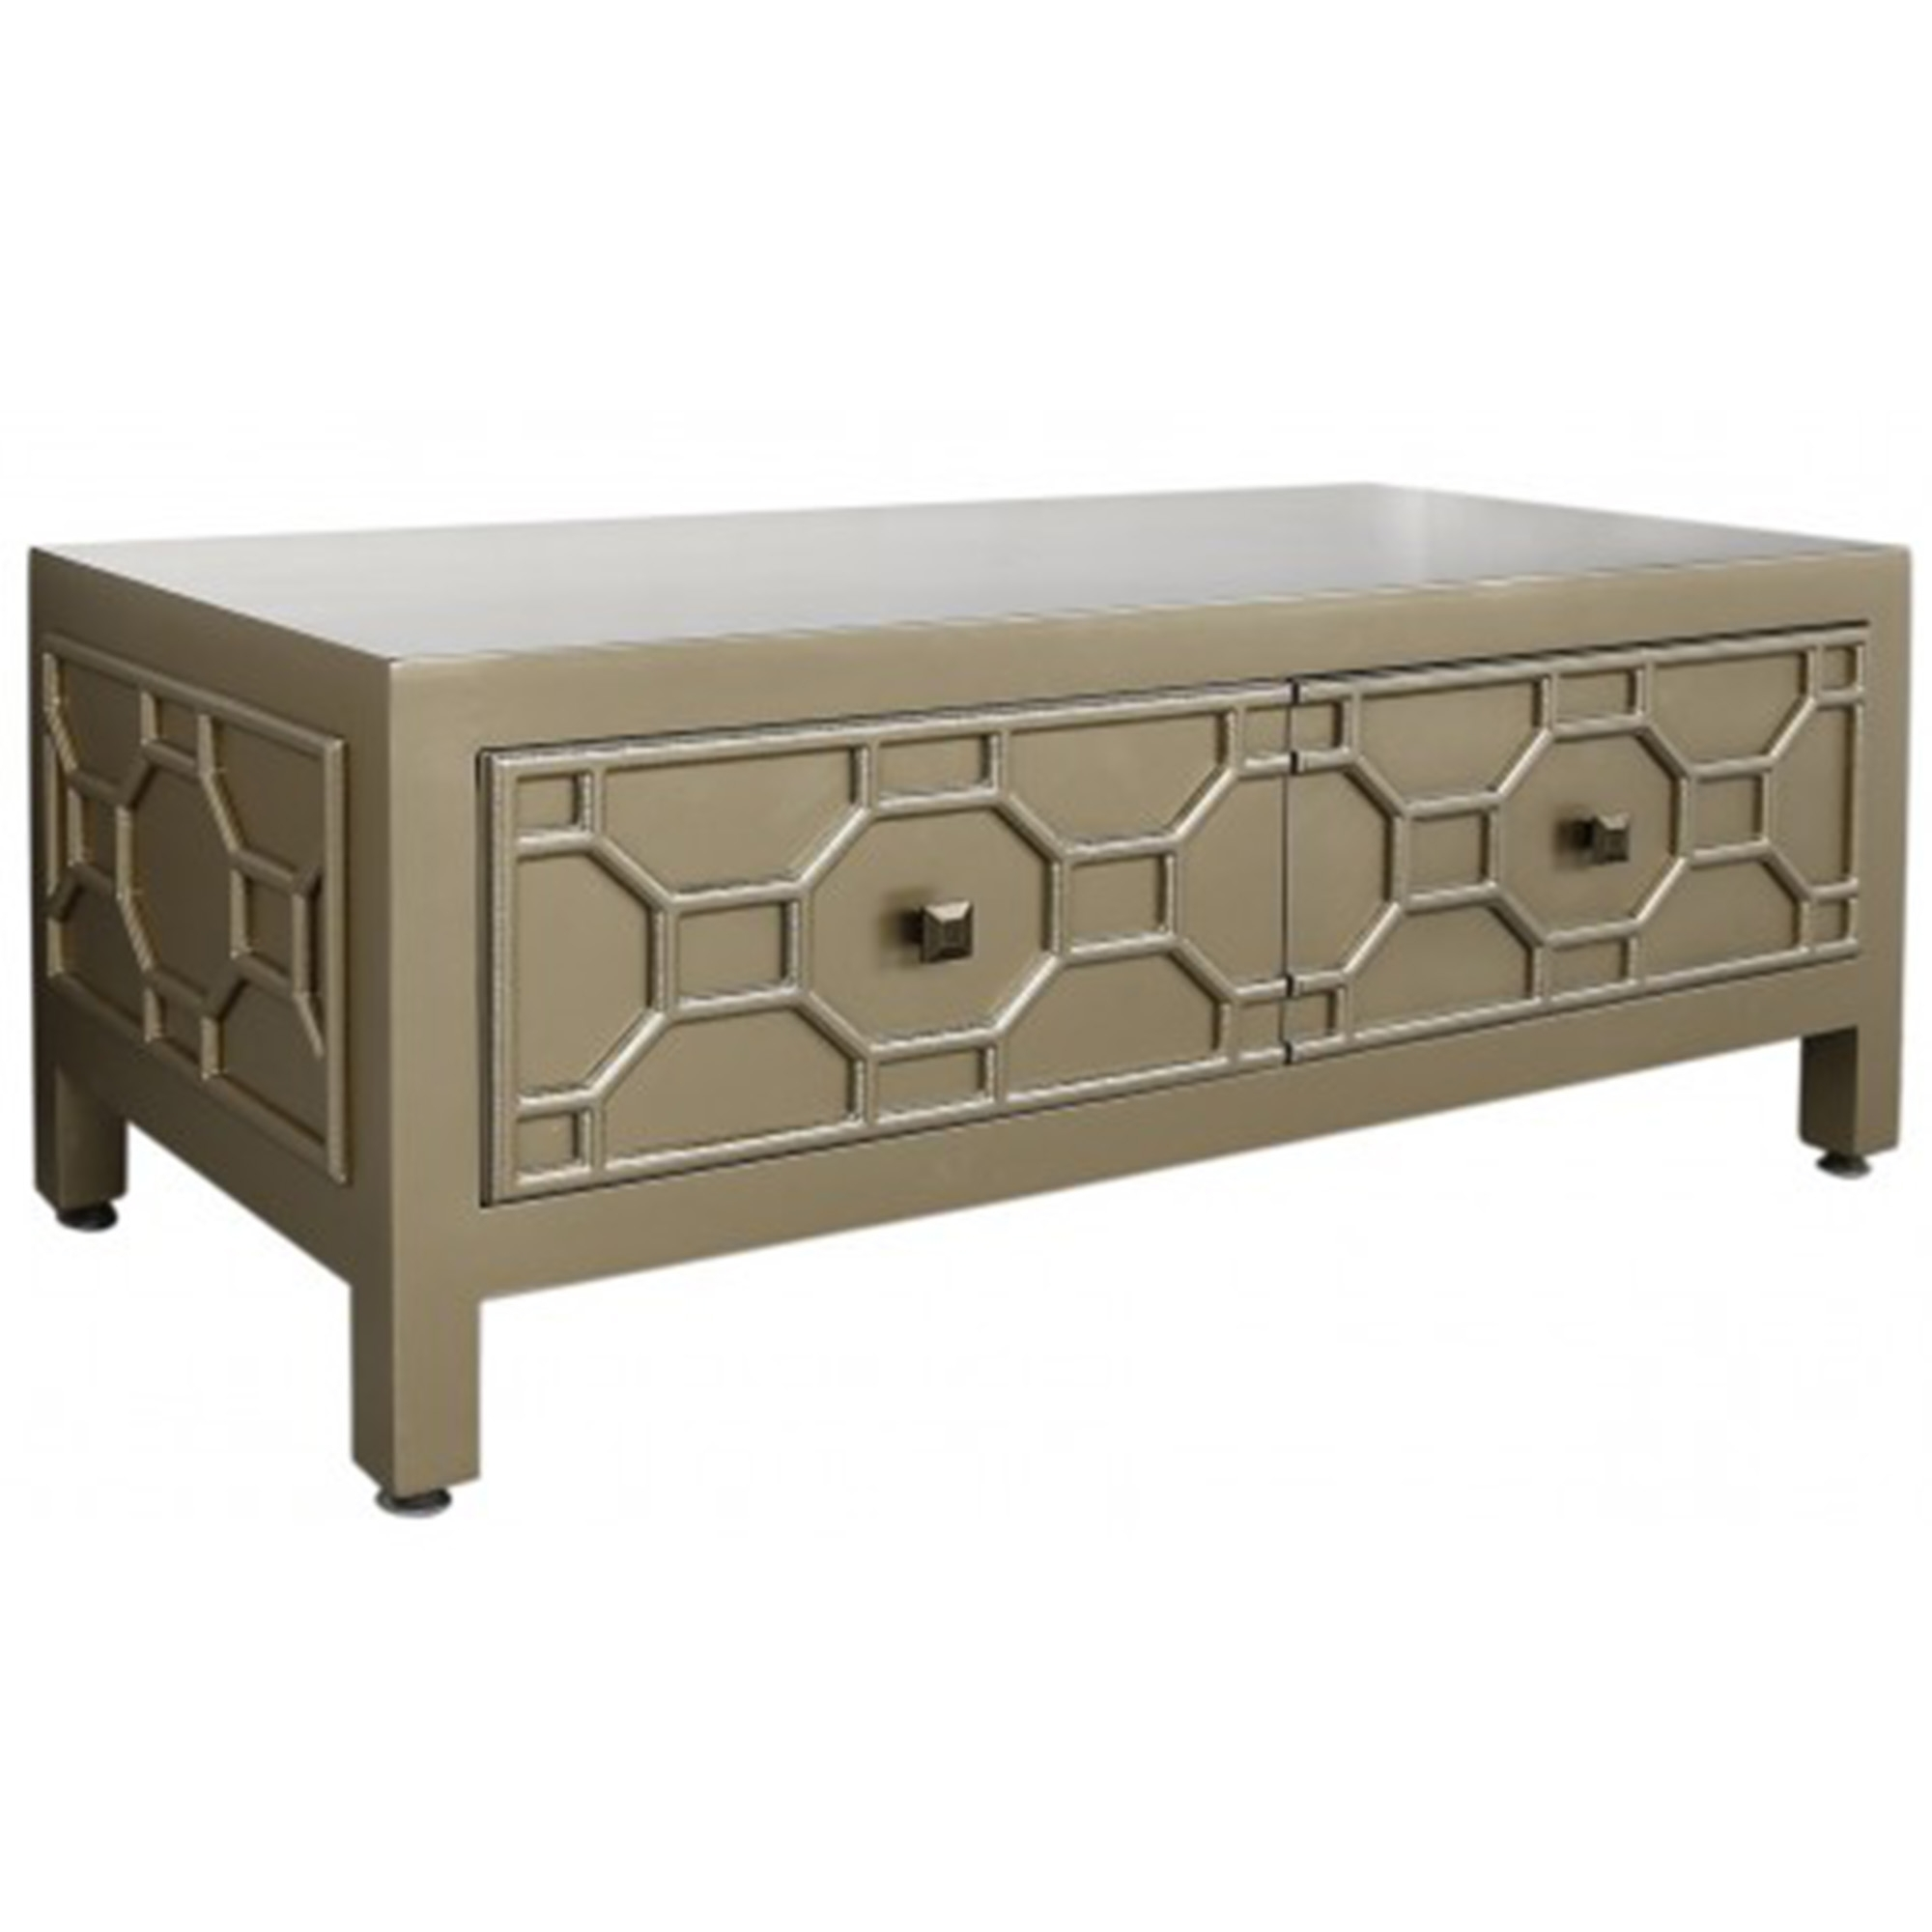 Wynn gold geometric coffee table contemporary modern for Geometric coffee table